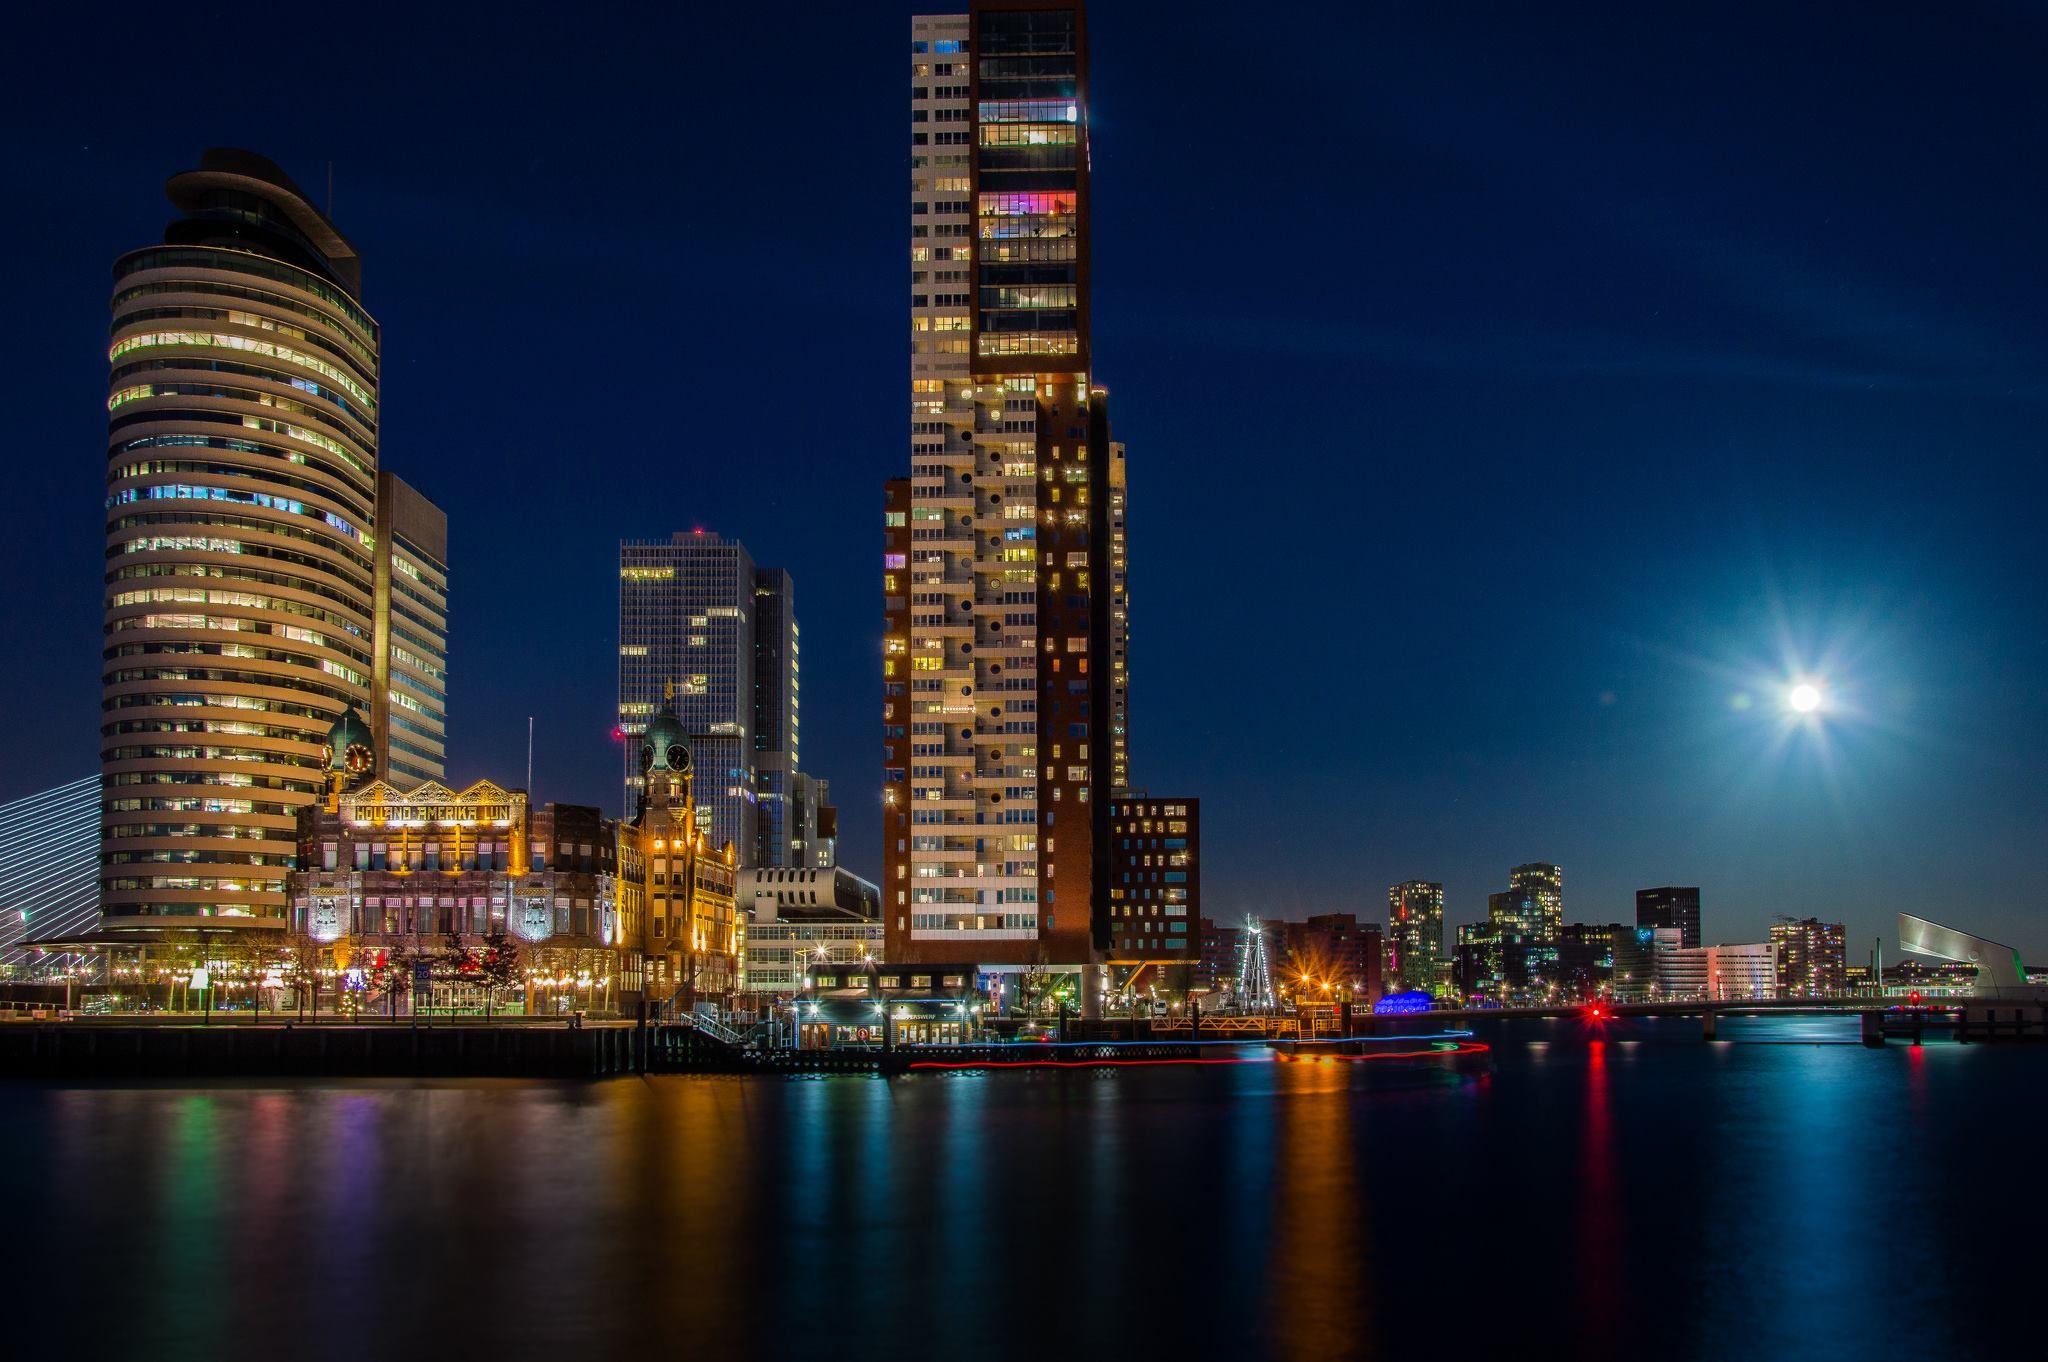 Hotel New York op Kop van Zuid Rotterdam rotterdam